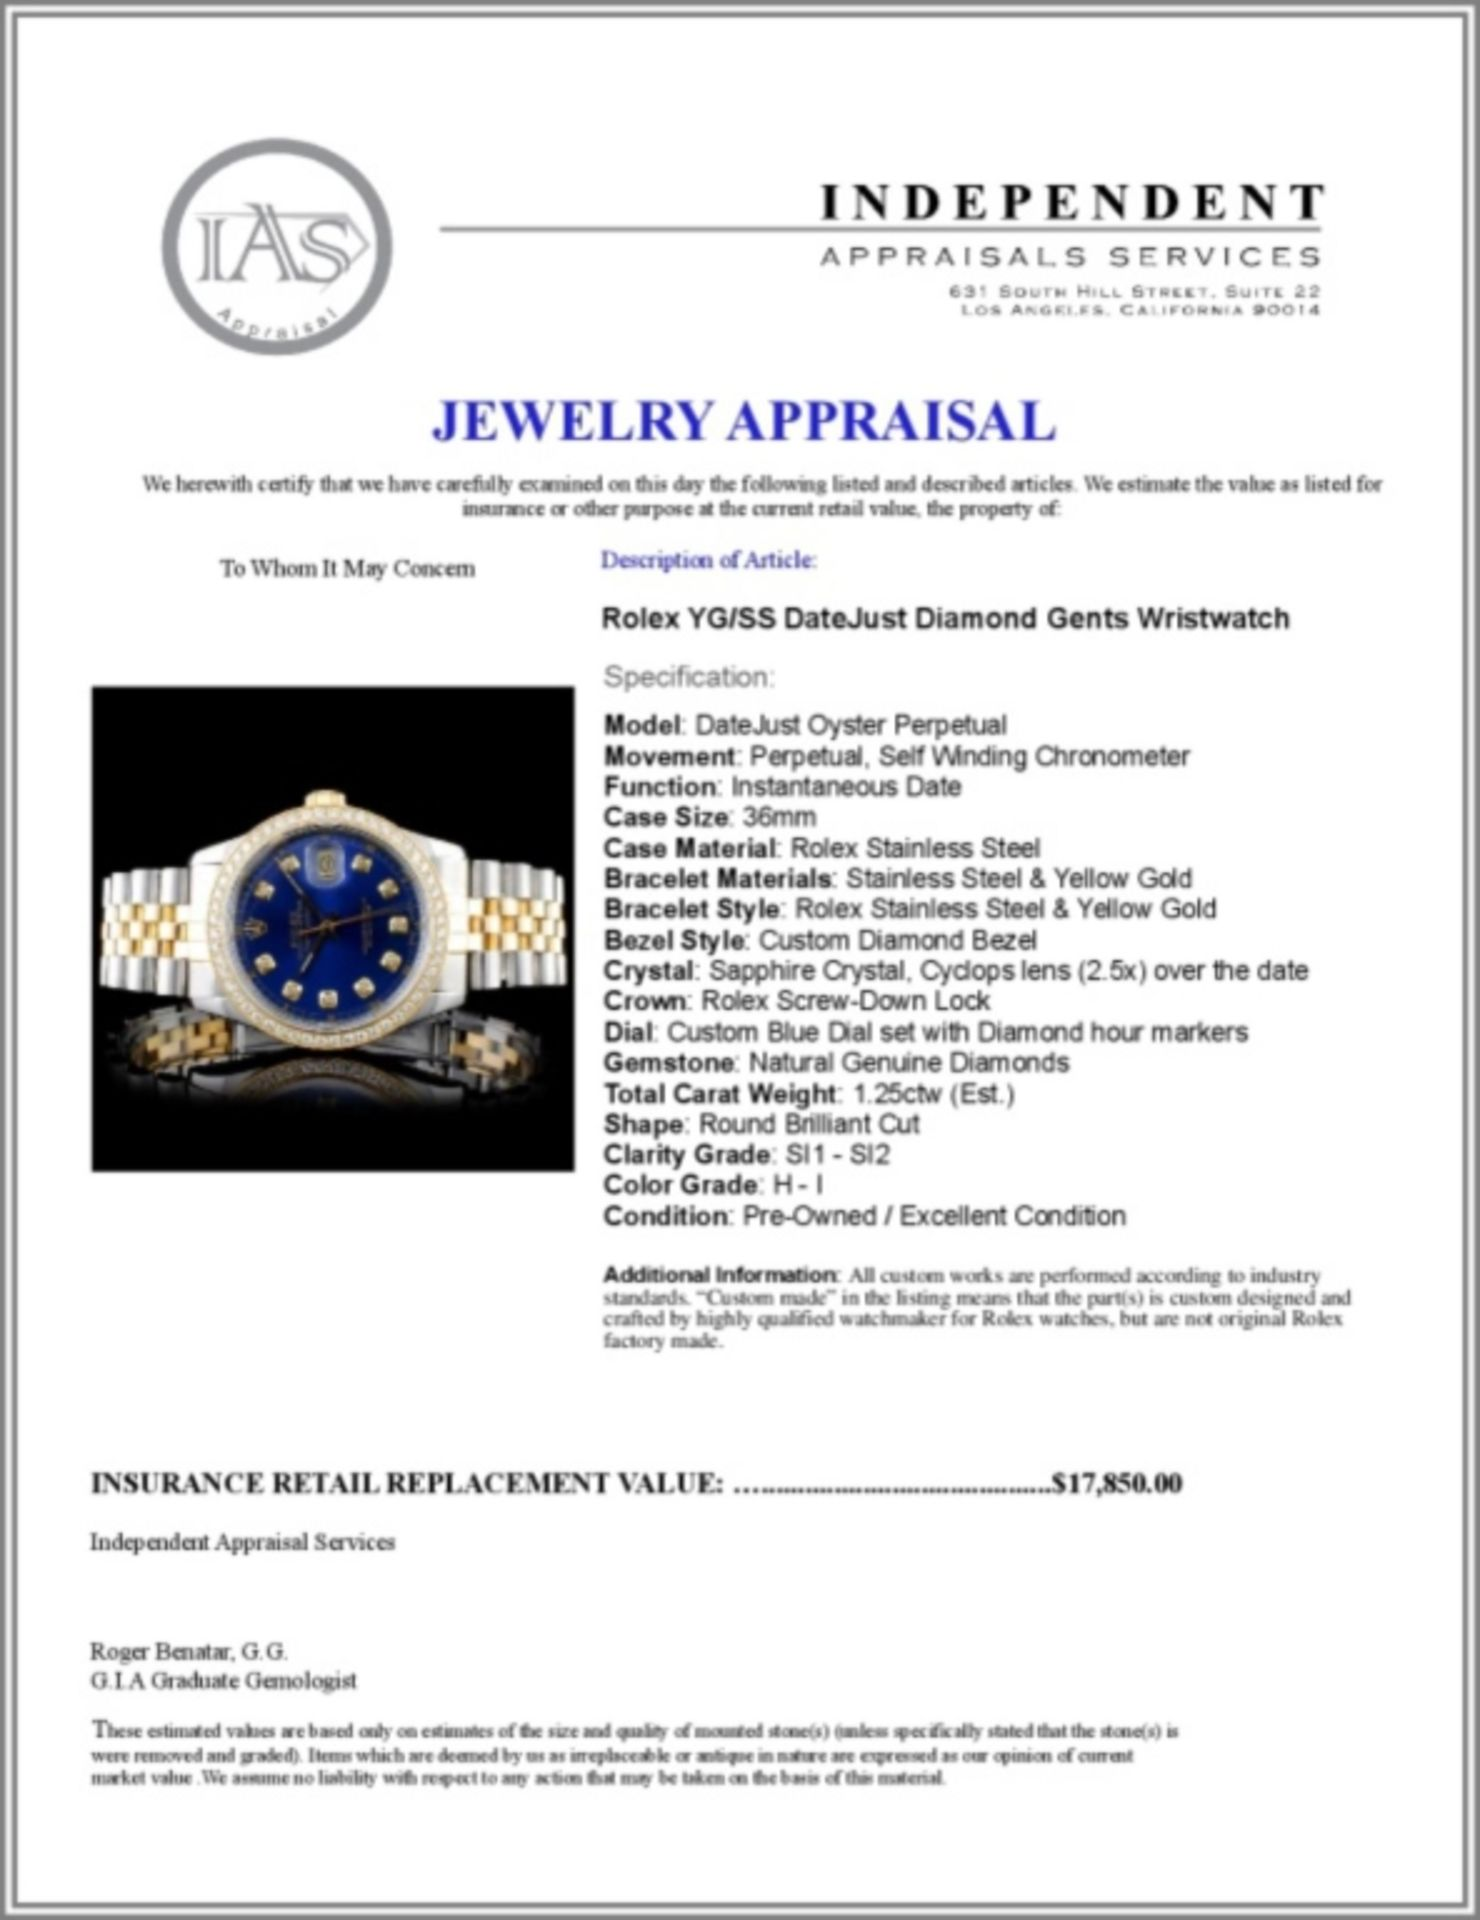 Rolex YG/SS DateJust Diamond 36MM Watch - Image 5 of 5